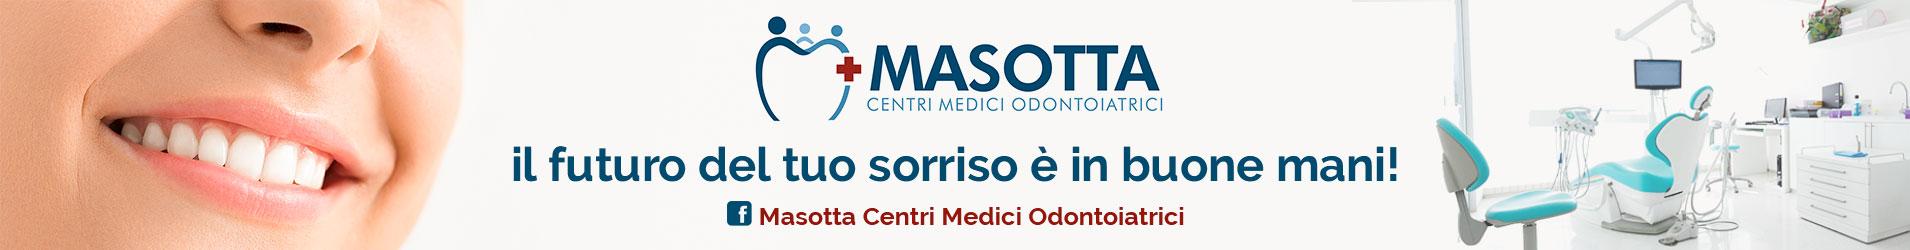 MASOTTA HOME DESKTOP